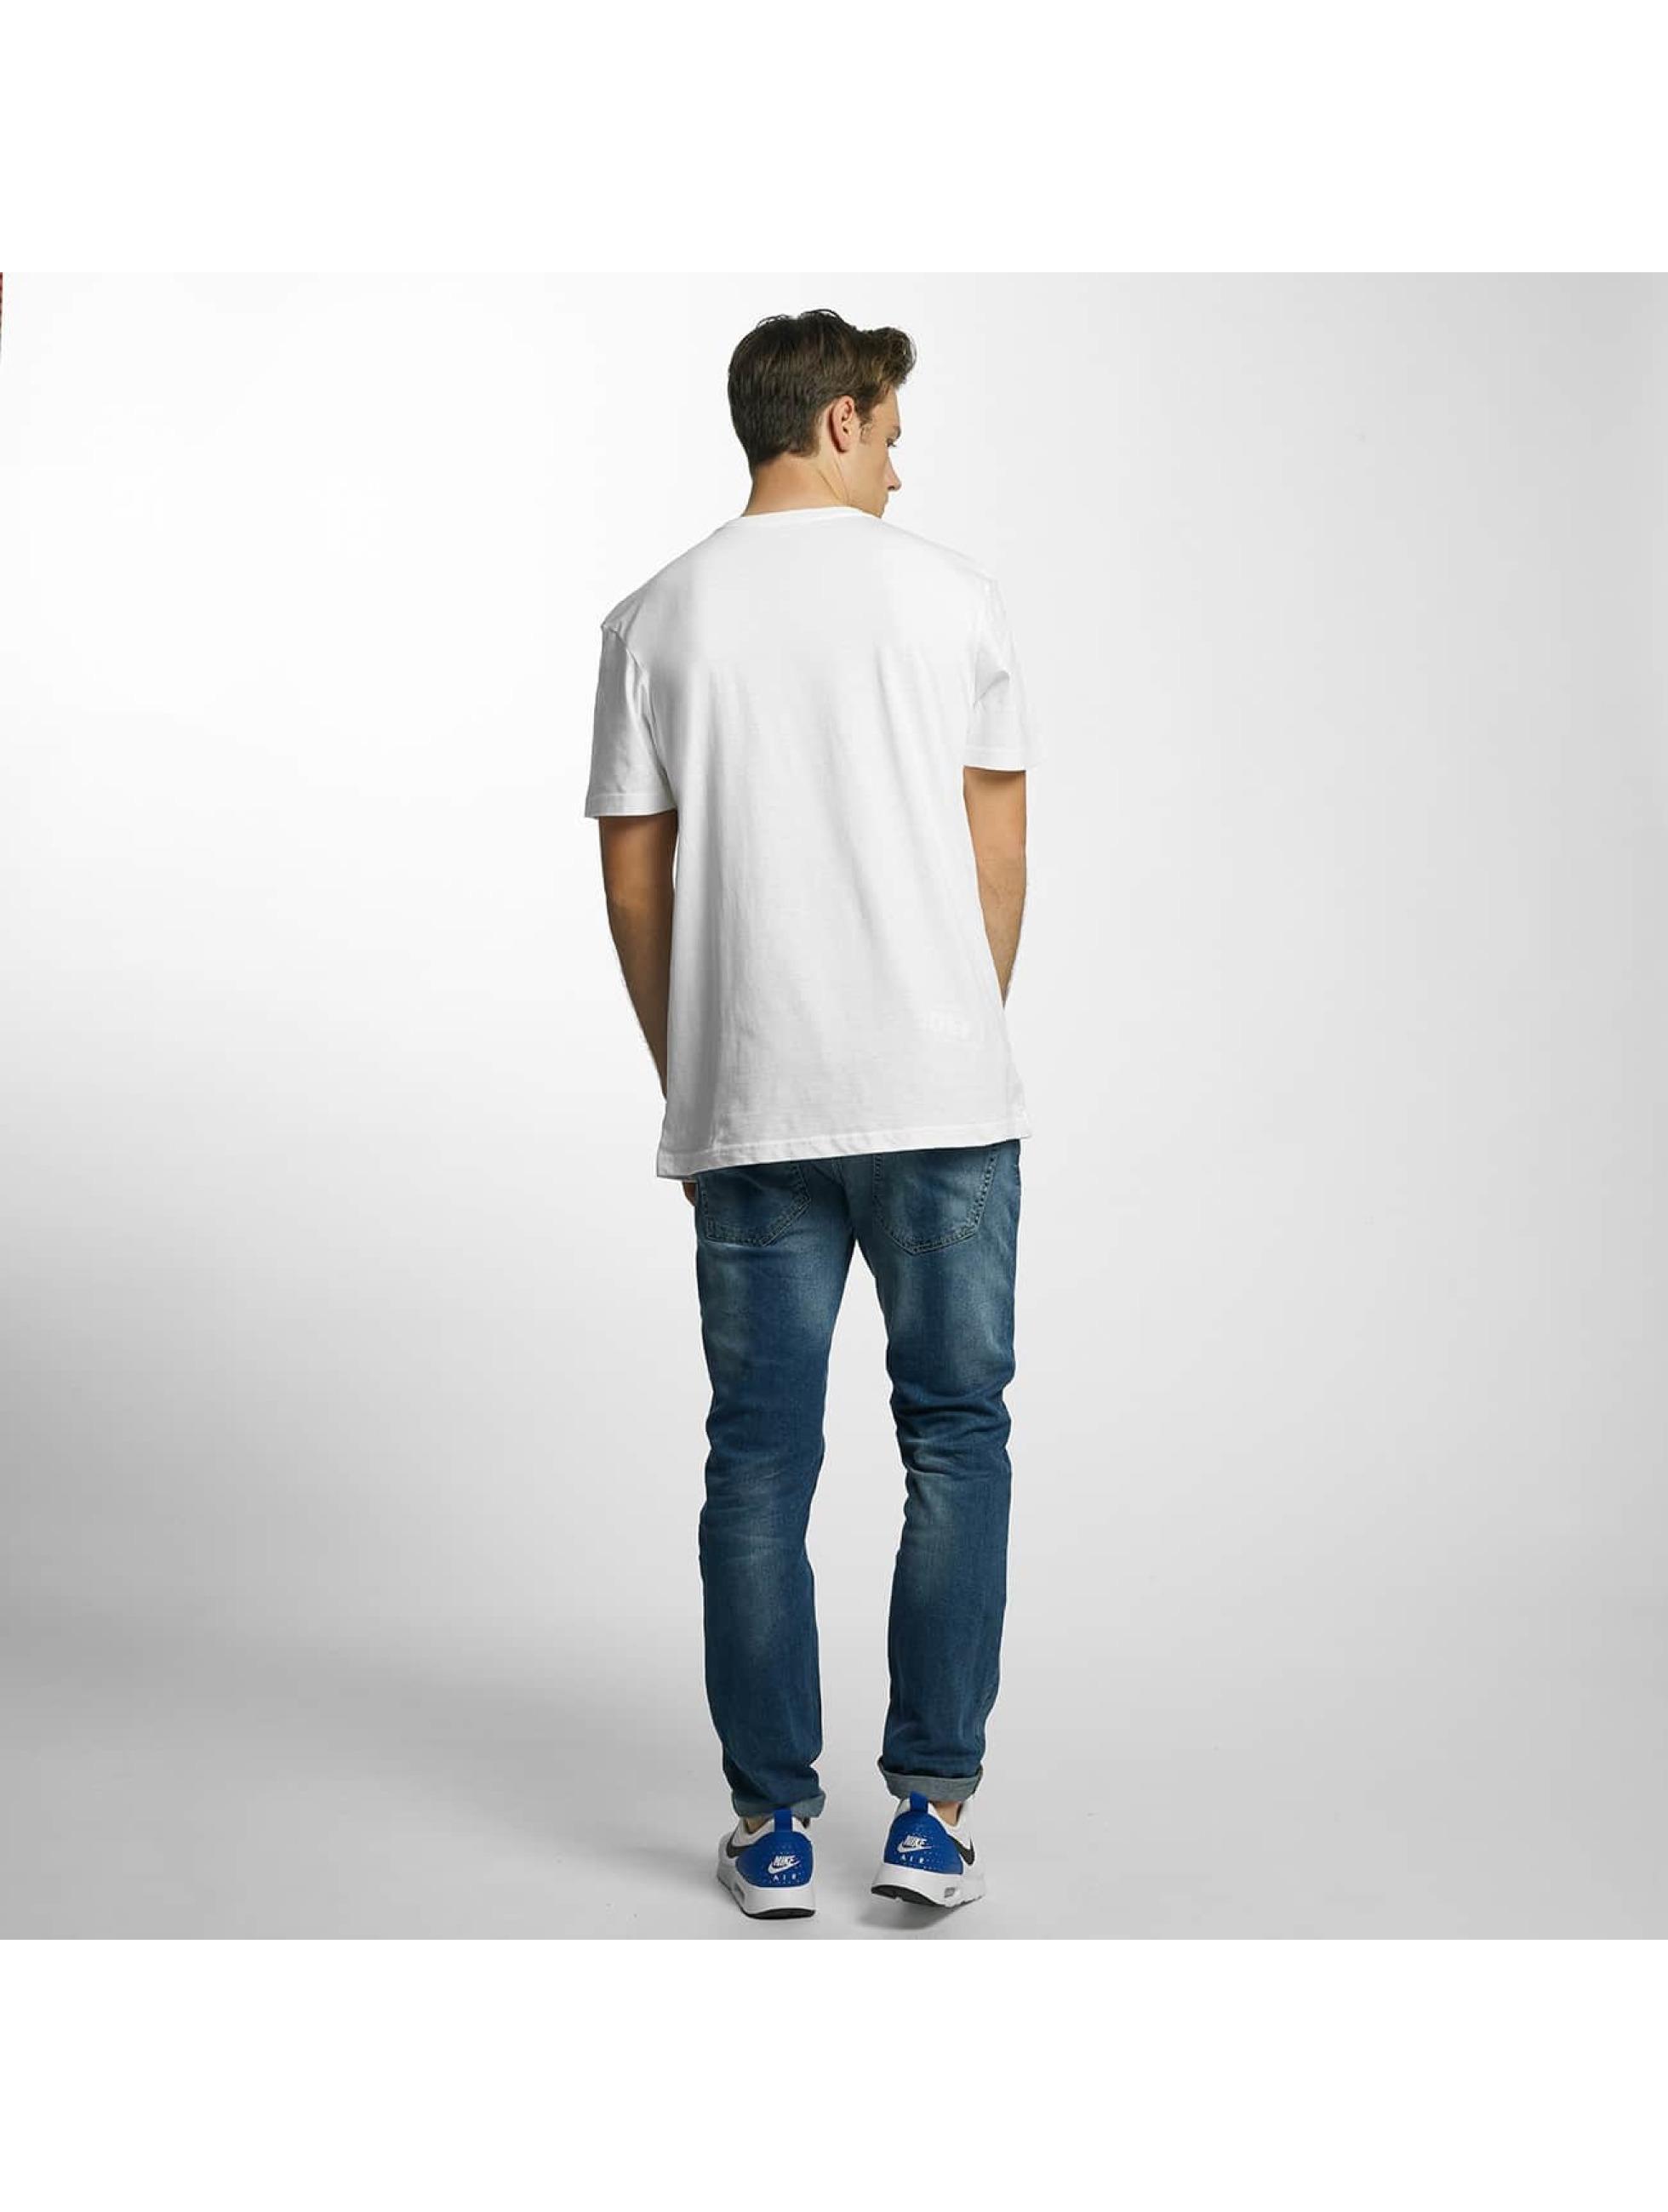 Quiksilver T-skjorter Classic Comfort Place hvit